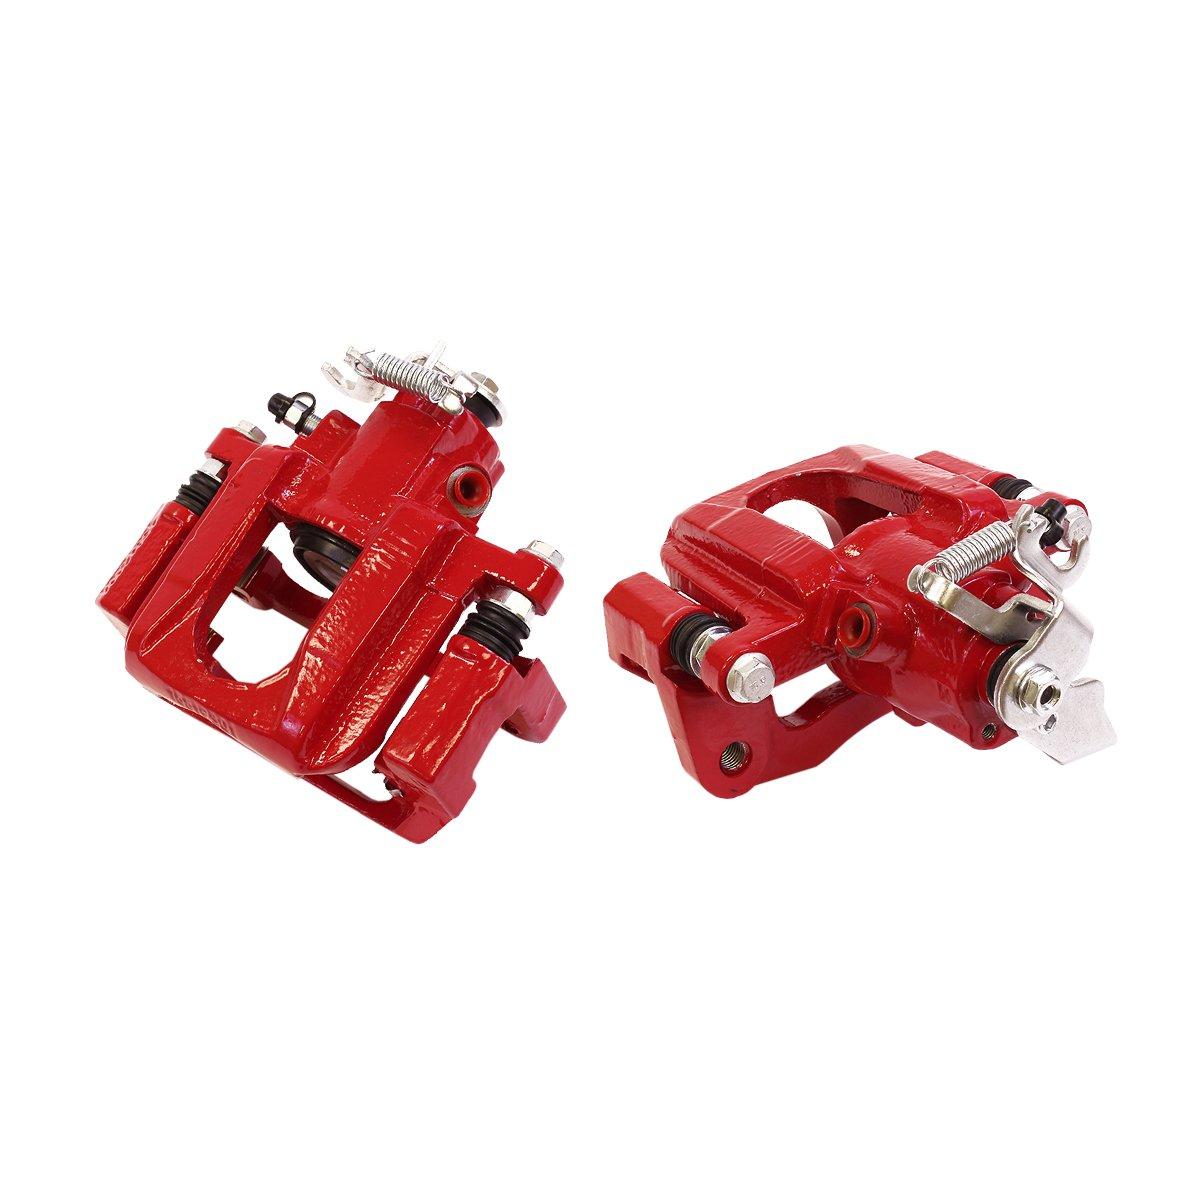 CCK03297 REAR [2] Performance Grade Red Powder Coated Semi-Loaded Caliper Assembly Pair Set